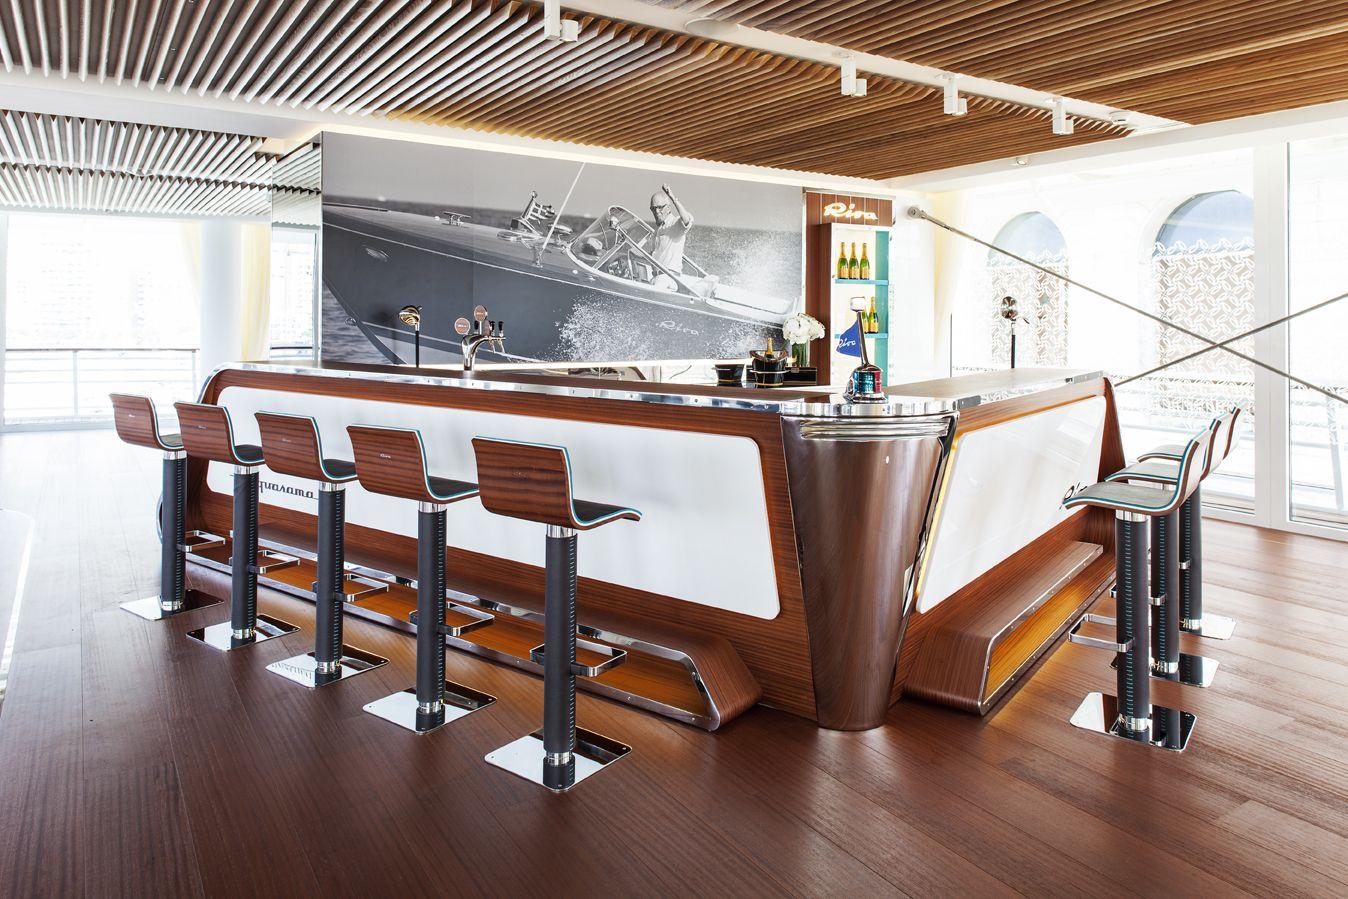 The Riva Yacht Aquarama Lounge